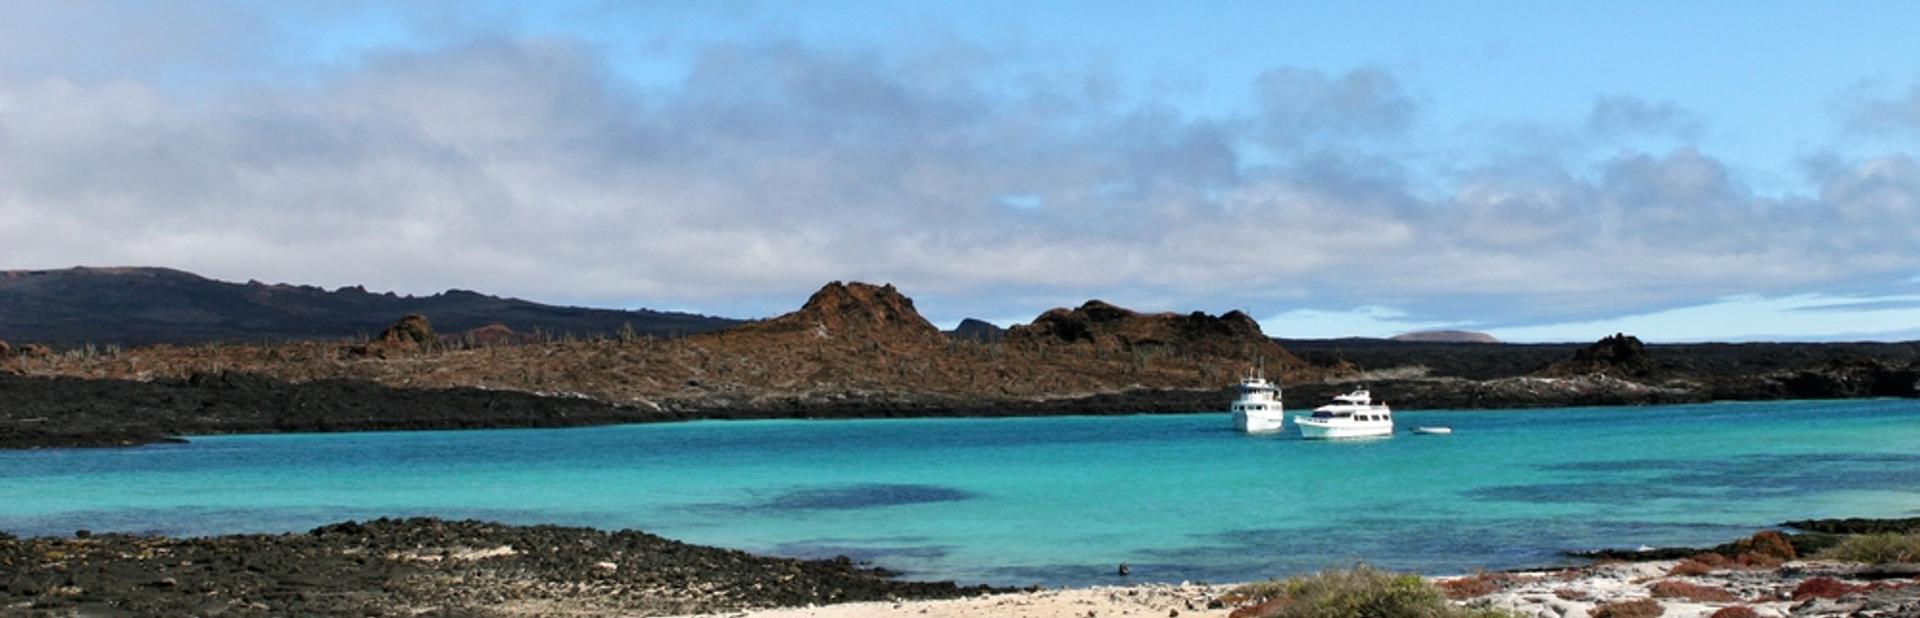 Galapagos Islands climate photo